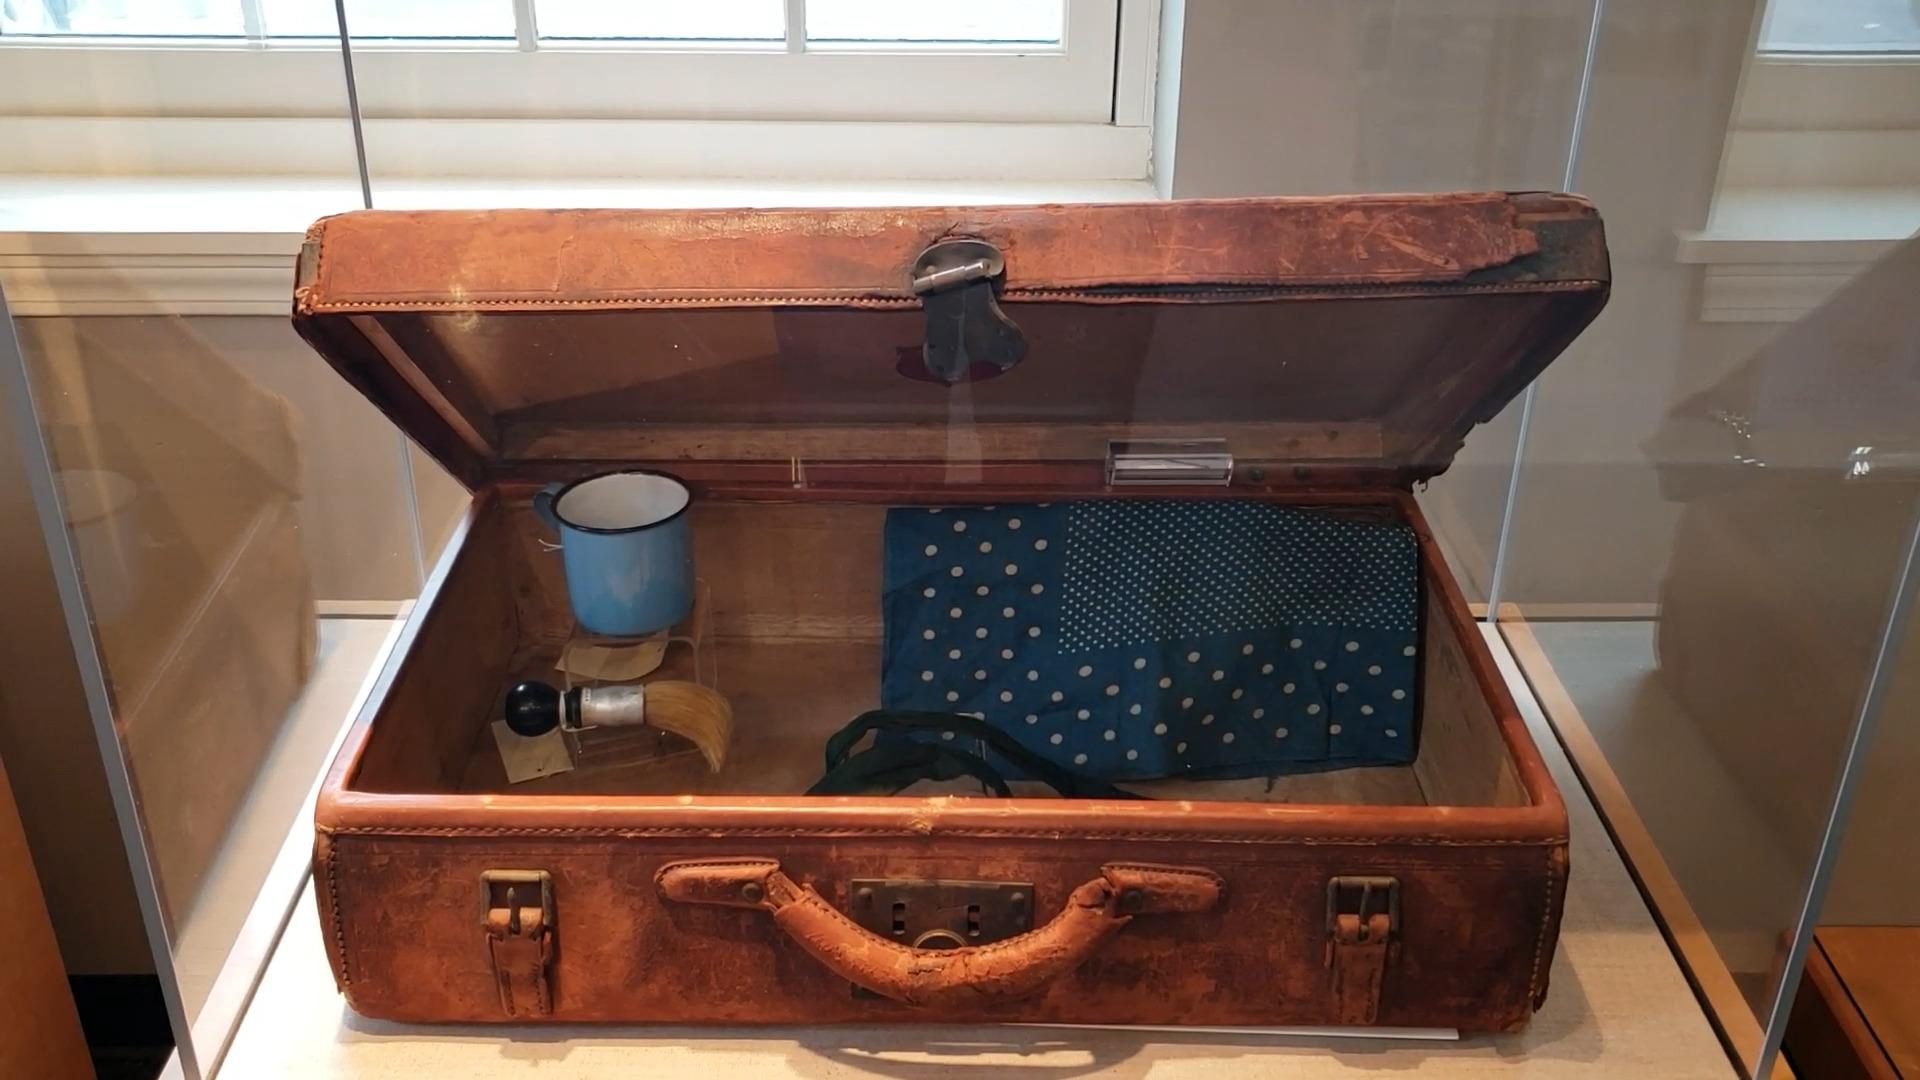 Suitcase exhibit reveals state asylum patients of the 1900s